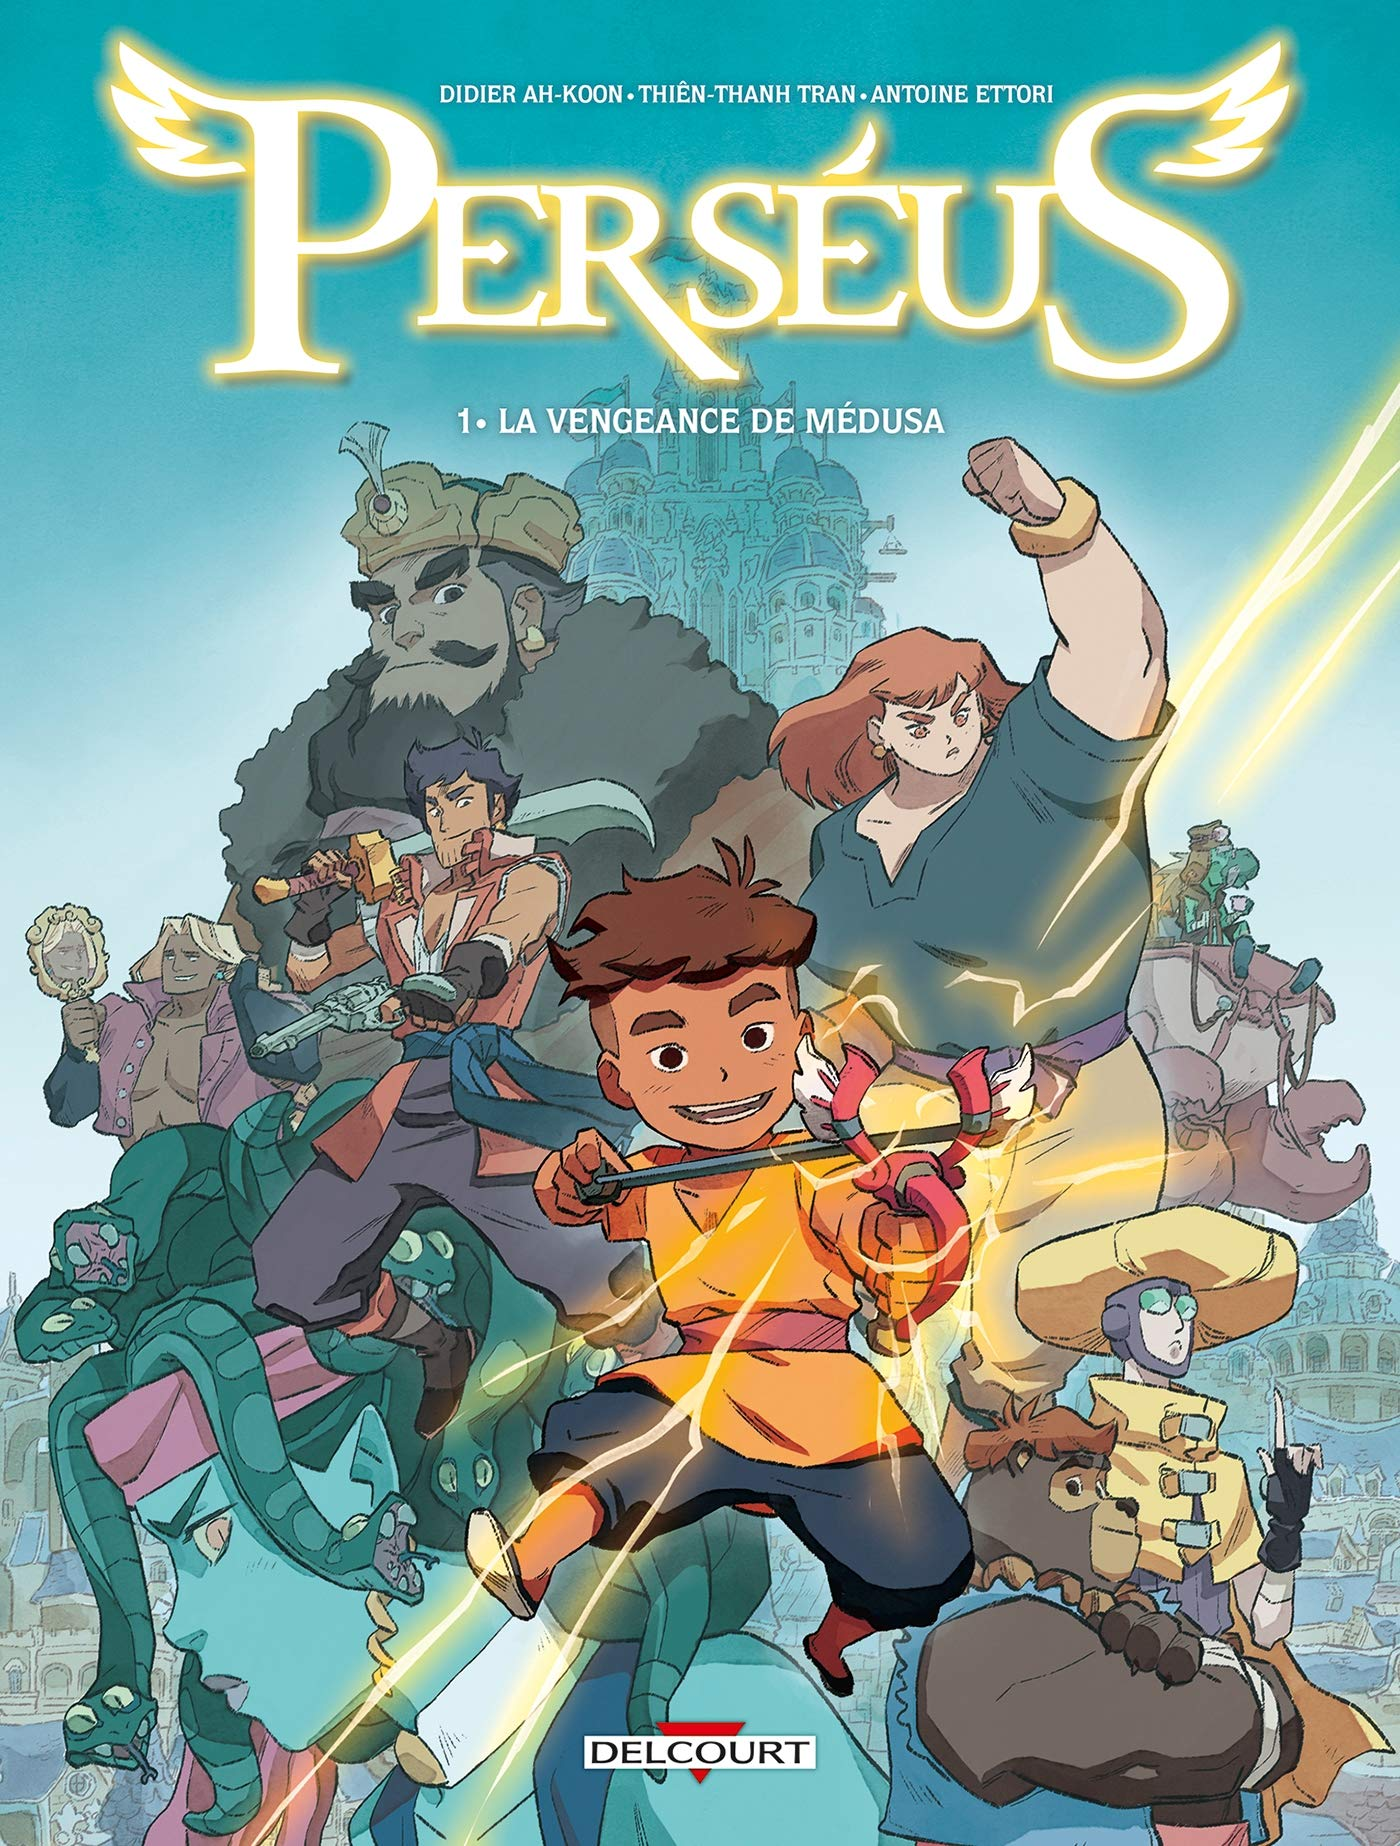 Perséus 1 - La vengeance de Médusa